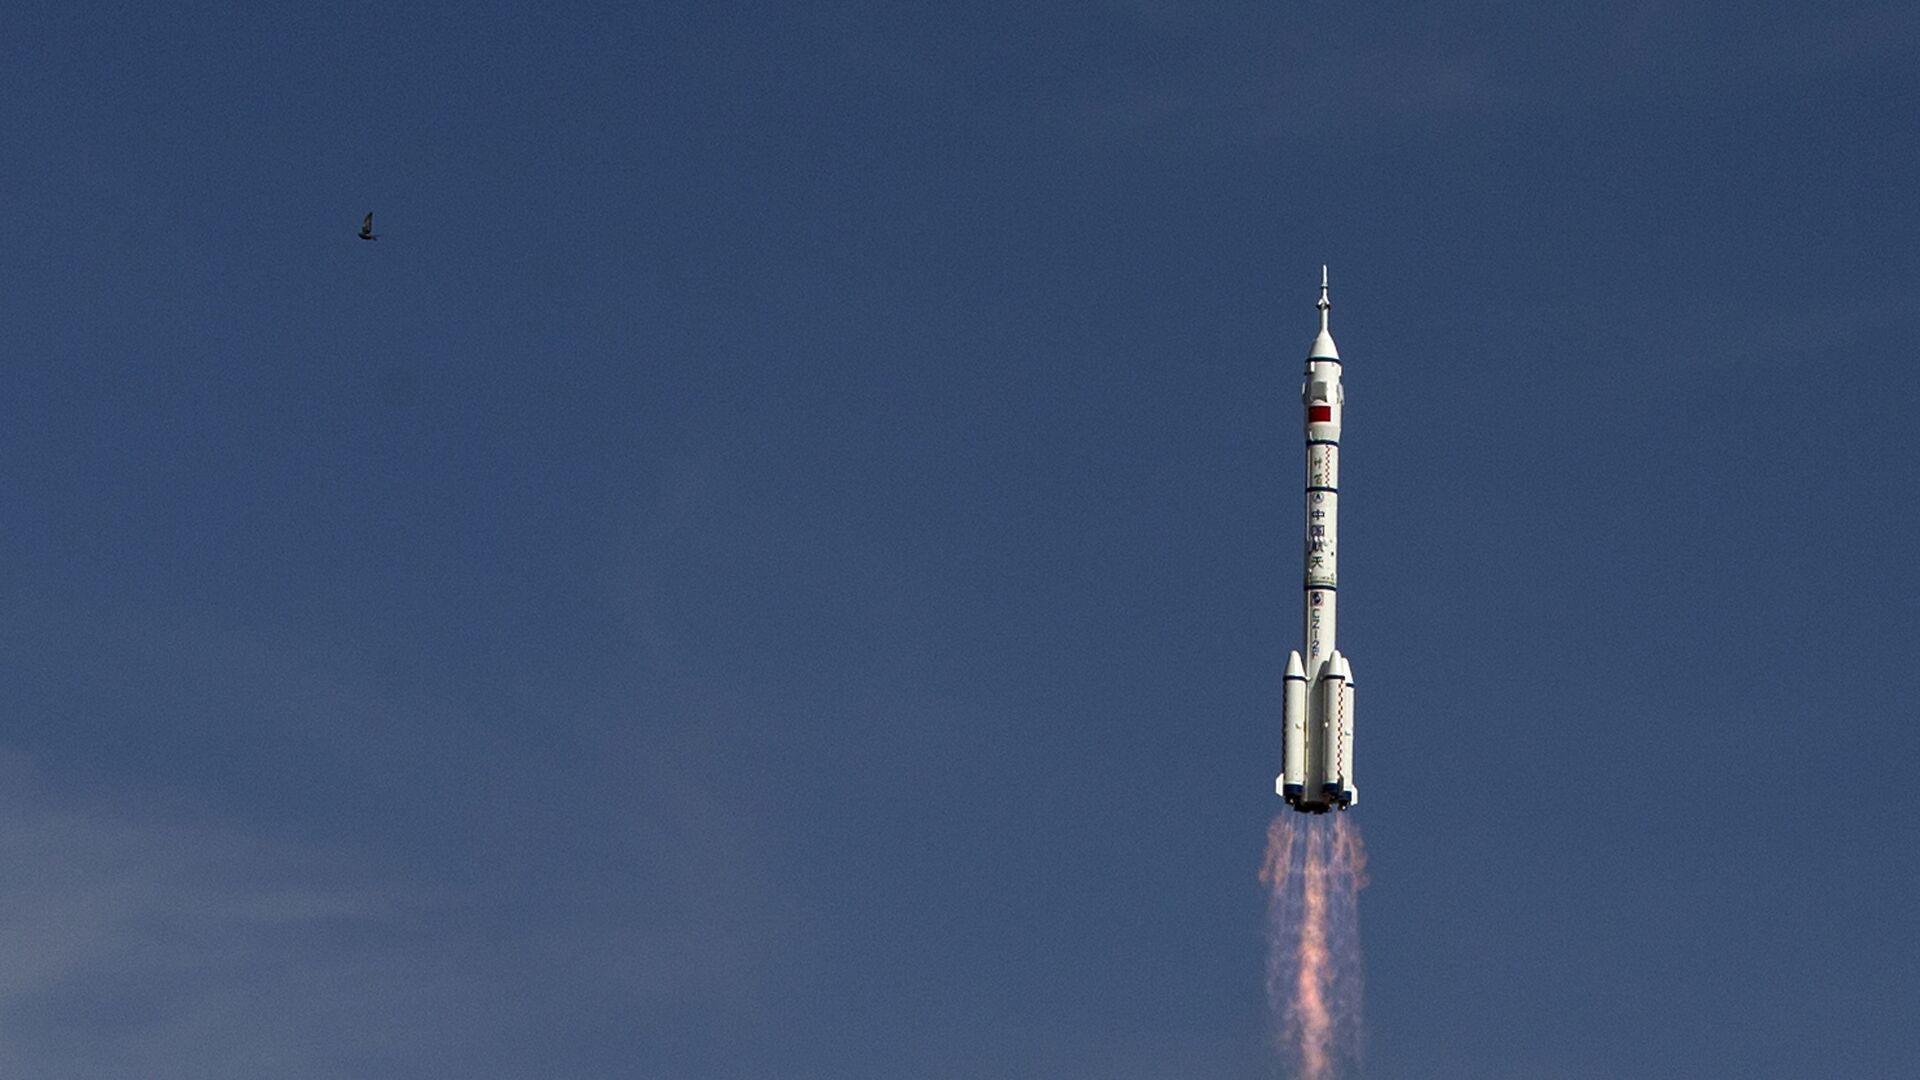 Старт ракеты-носителя Чанчжэн-2F c космодрома Цзюцюань, КНР. Архивное фото - Sputnik Italia, 1920, 05.05.2021